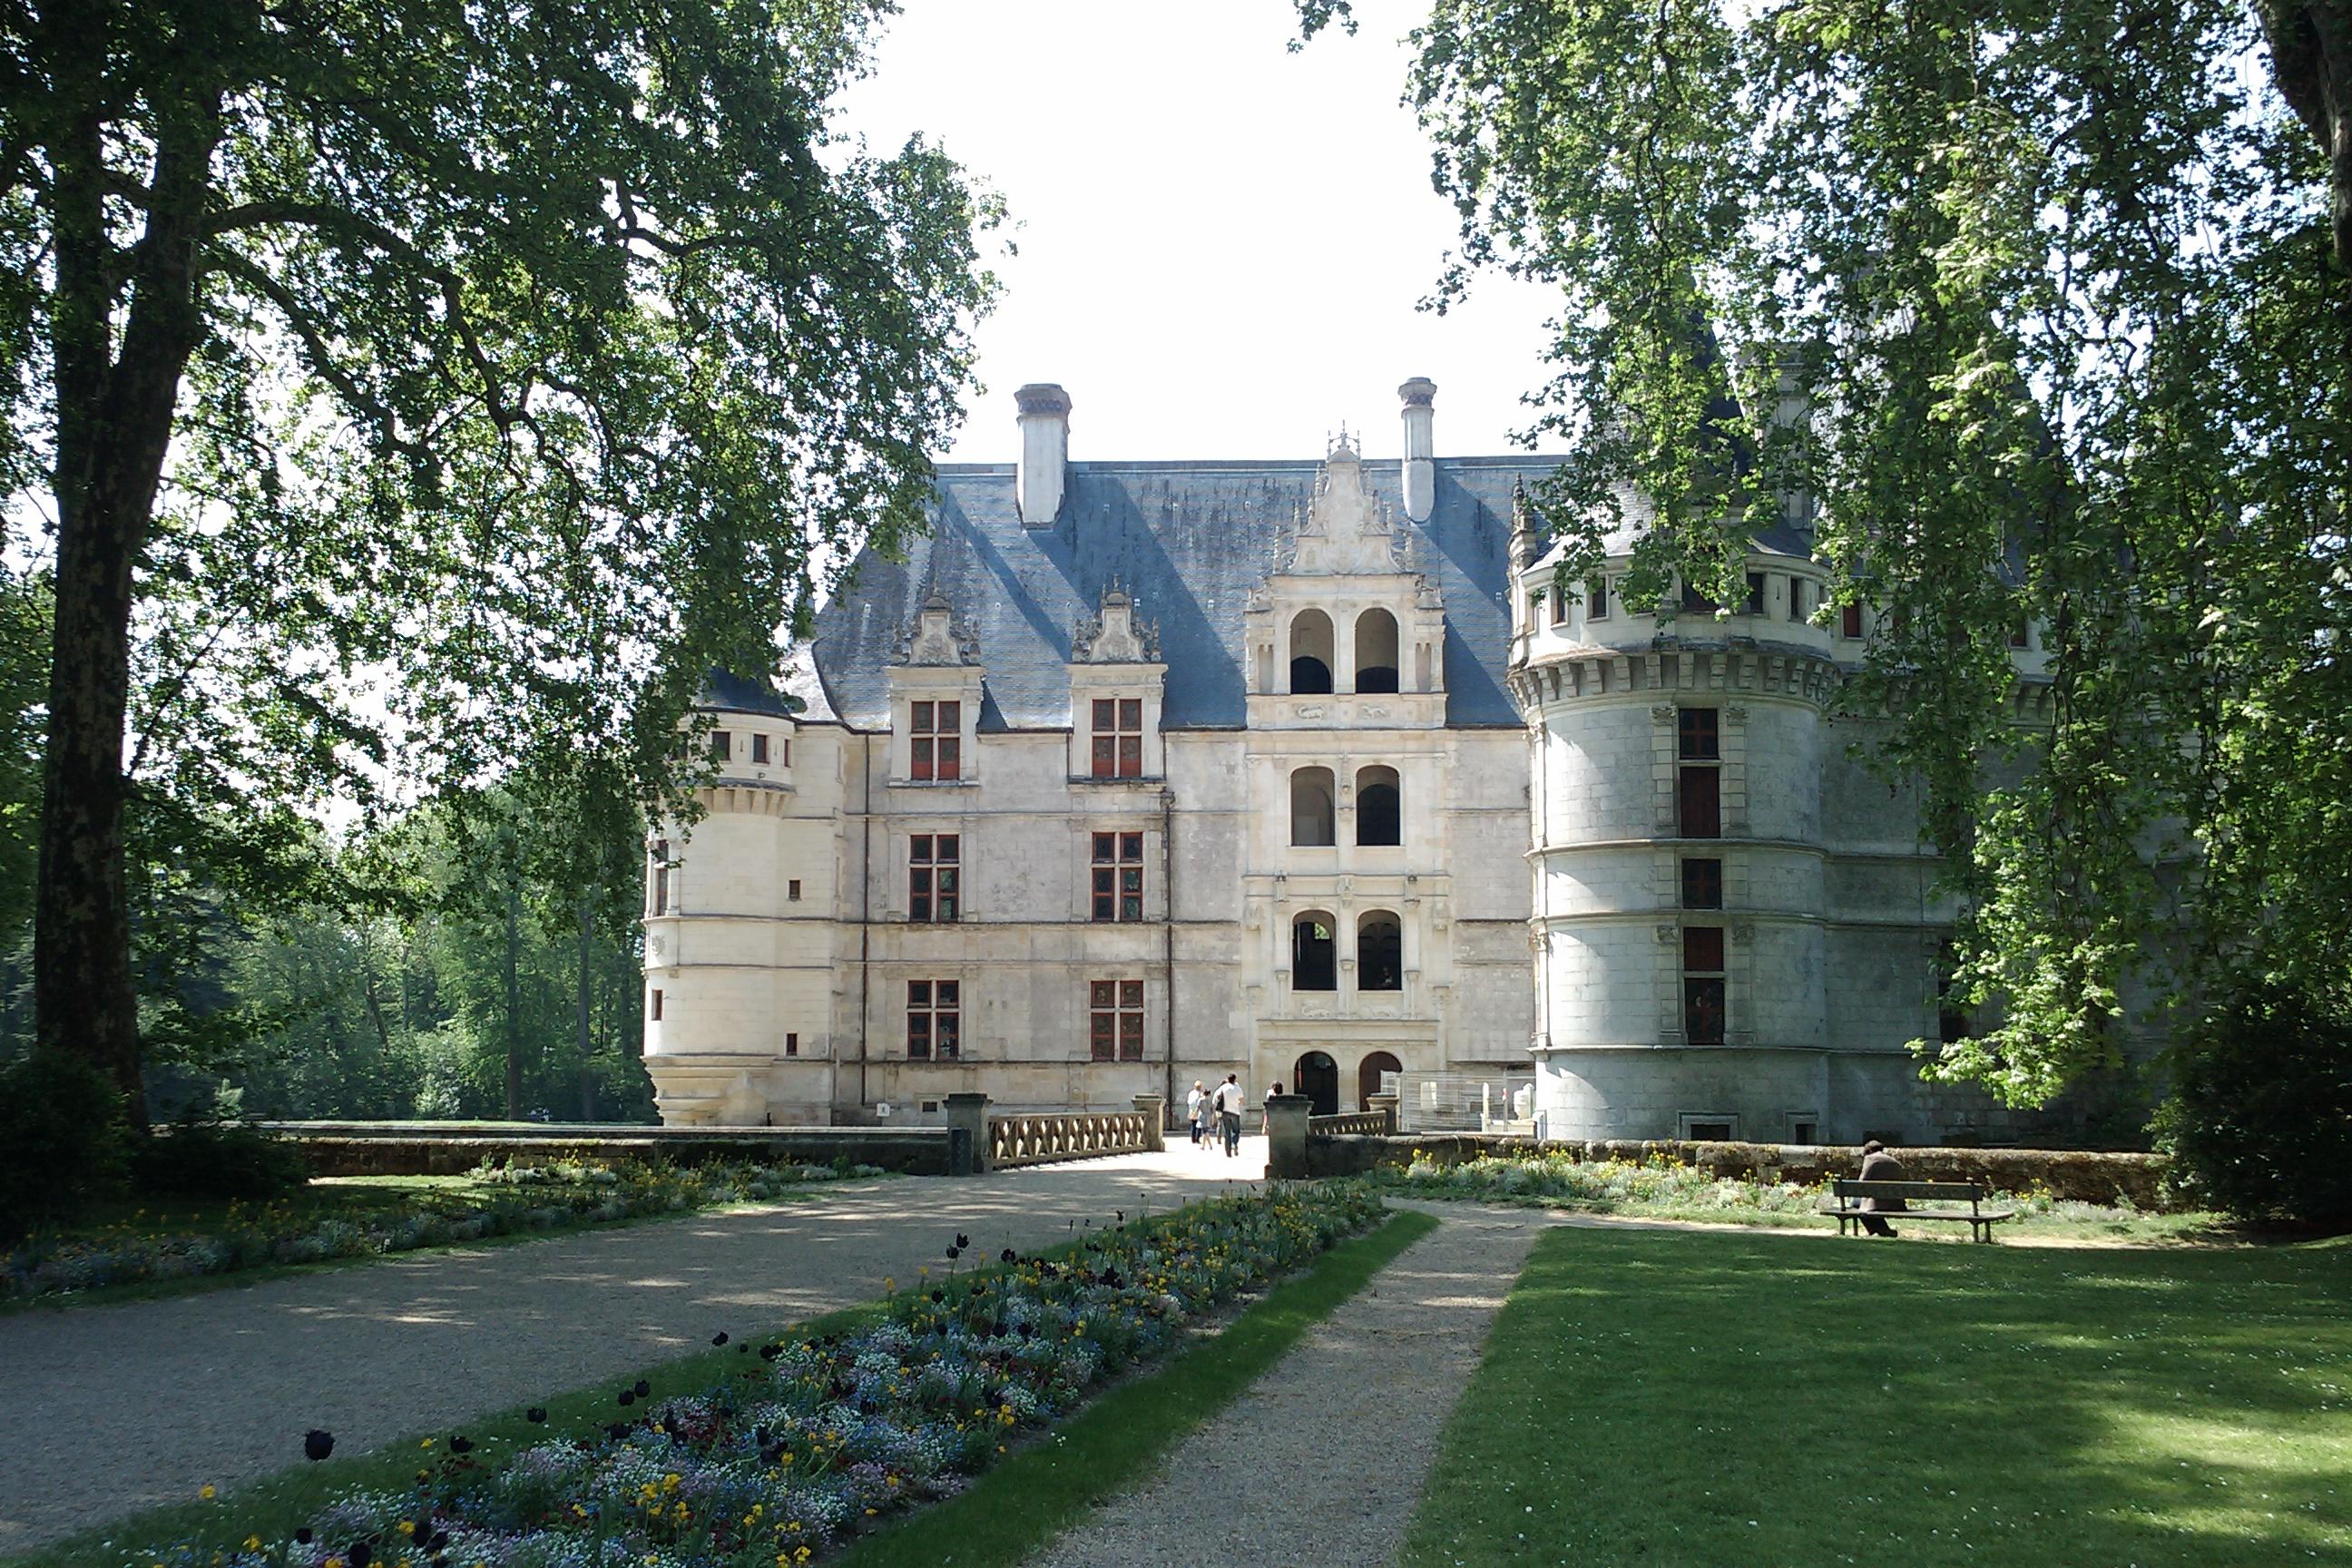 59-chateau_d'azay-le-rideau_3.jpg